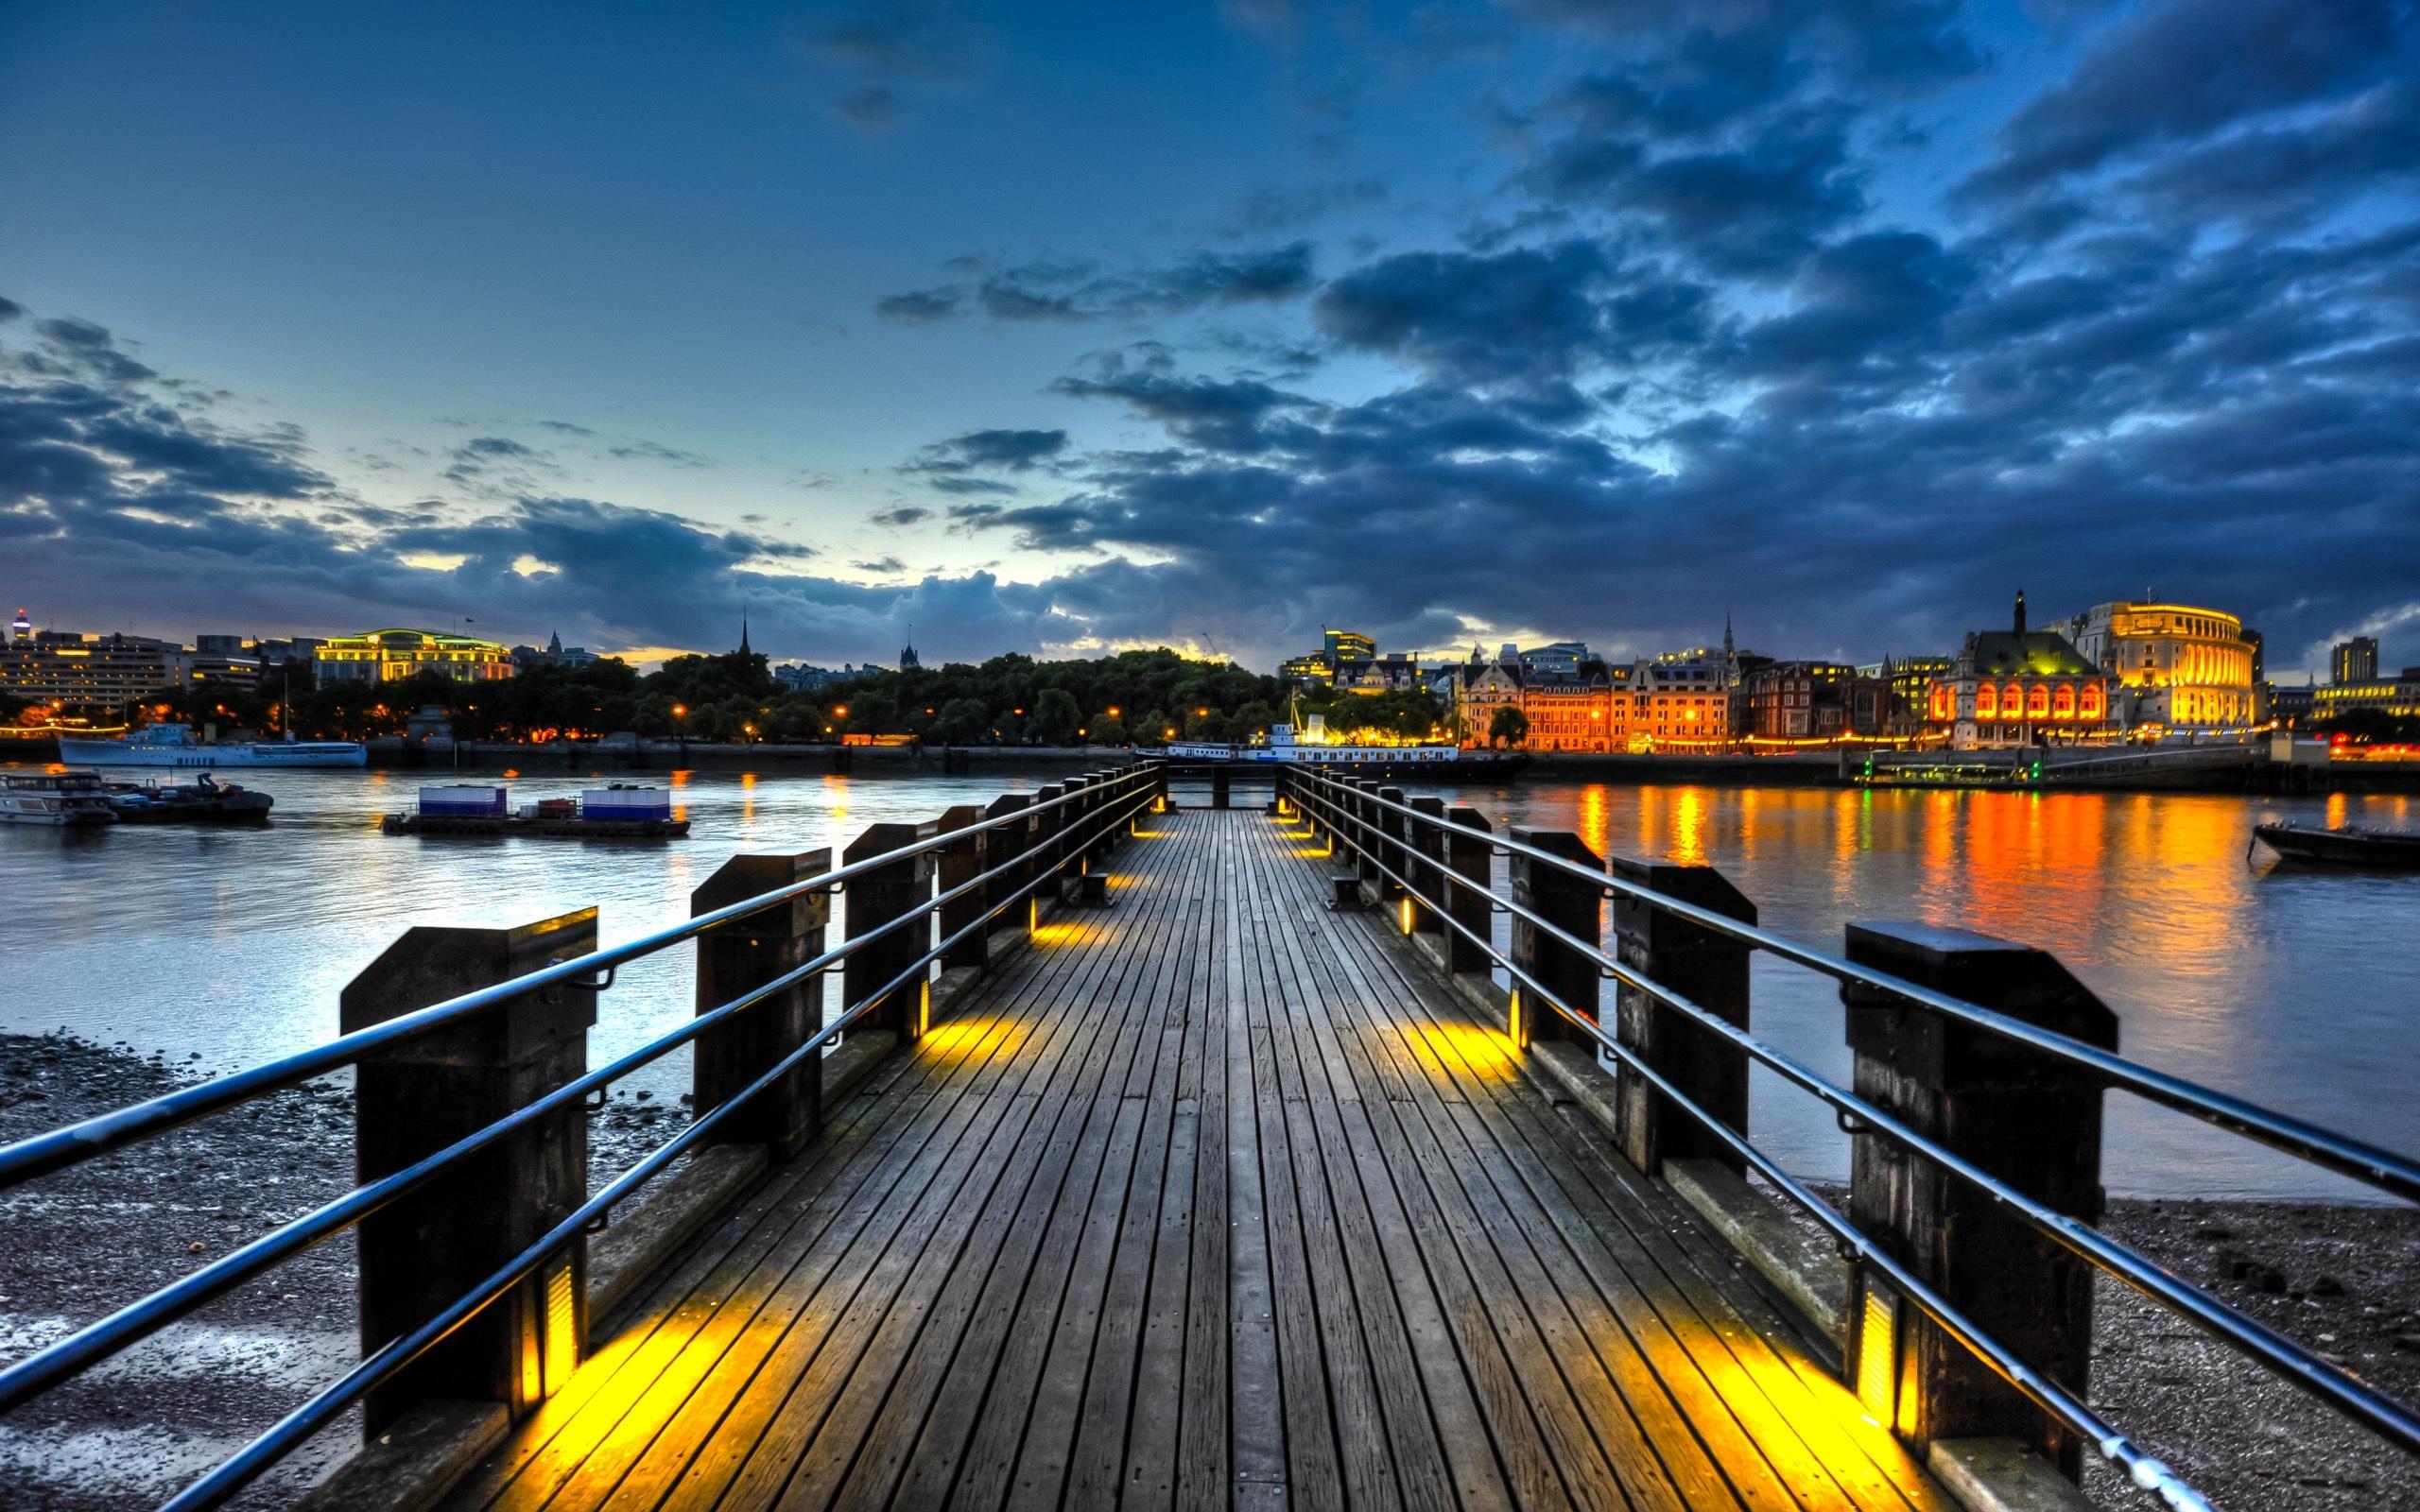 Thames pier mac wallpaper download free mac wallpapers - Full hd wallpapers for macbook pro ...